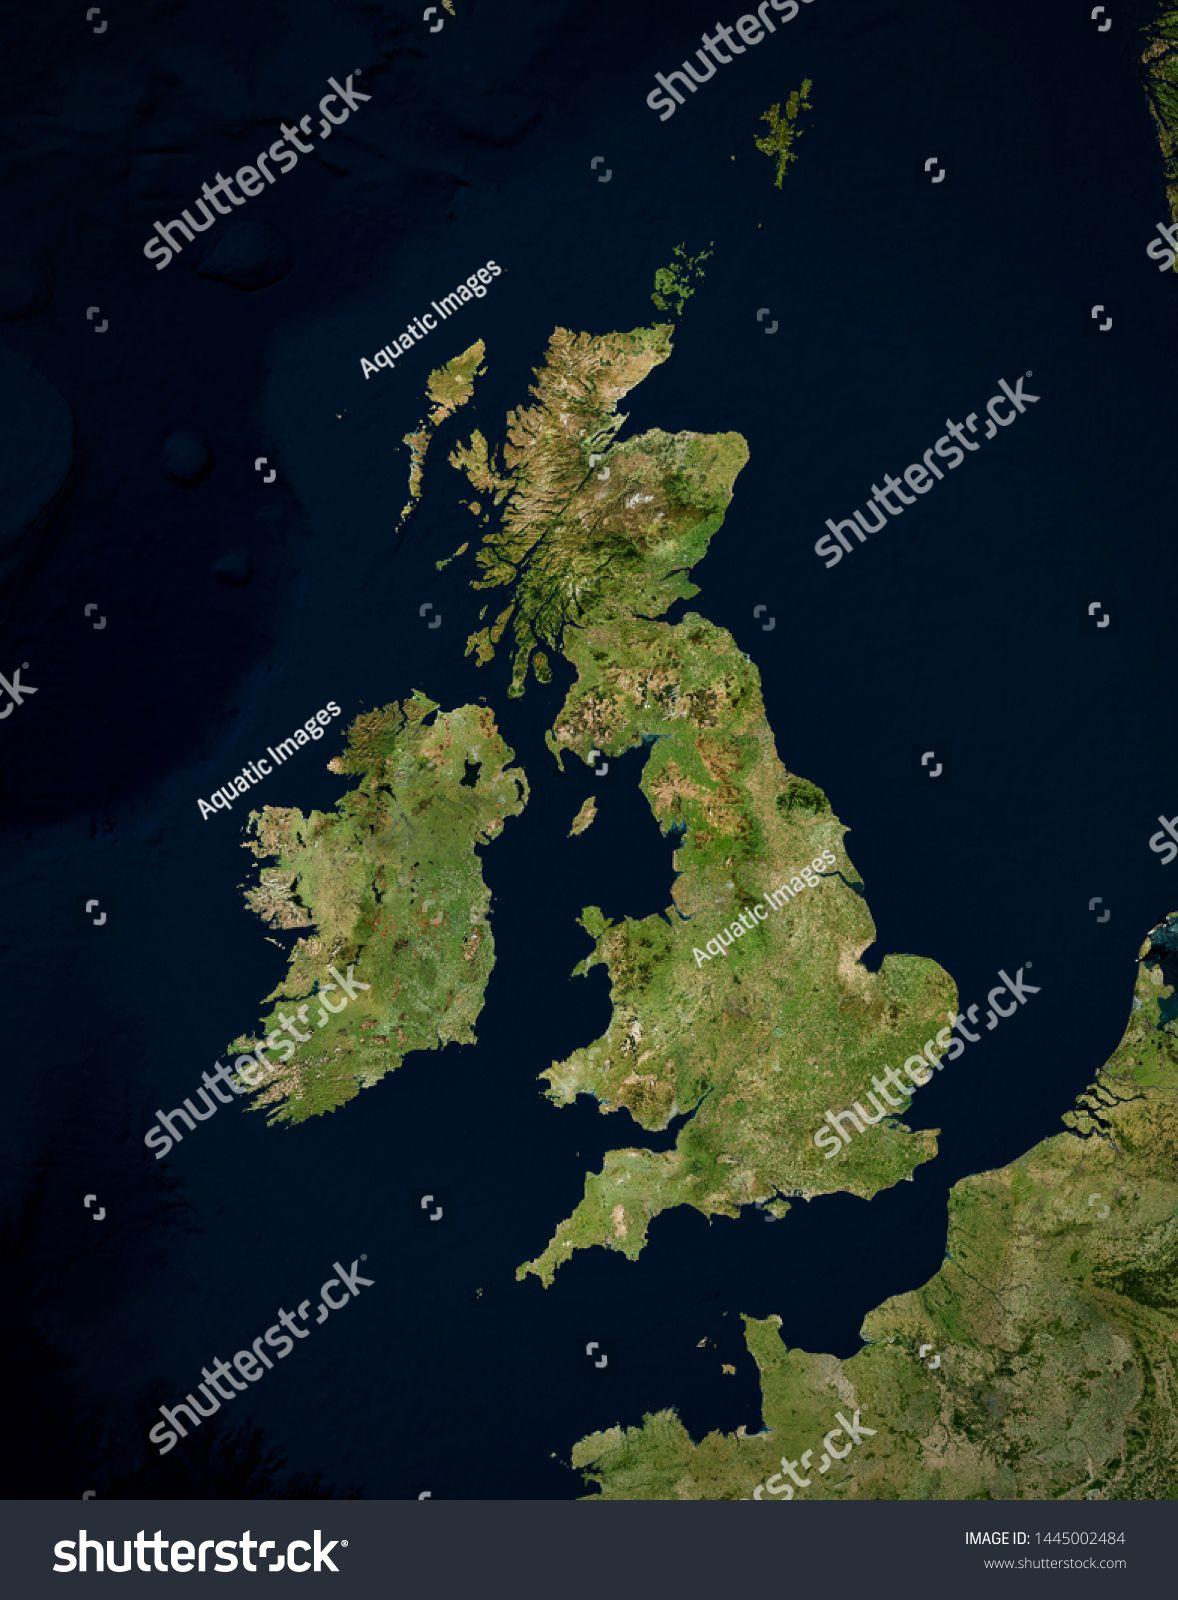 High Resolution Satellite Image Of Uk Ireland Isolated Imagery Of North Europe Elements Of This Image Furnished By Nasa Satellite Image Image Stock Photos